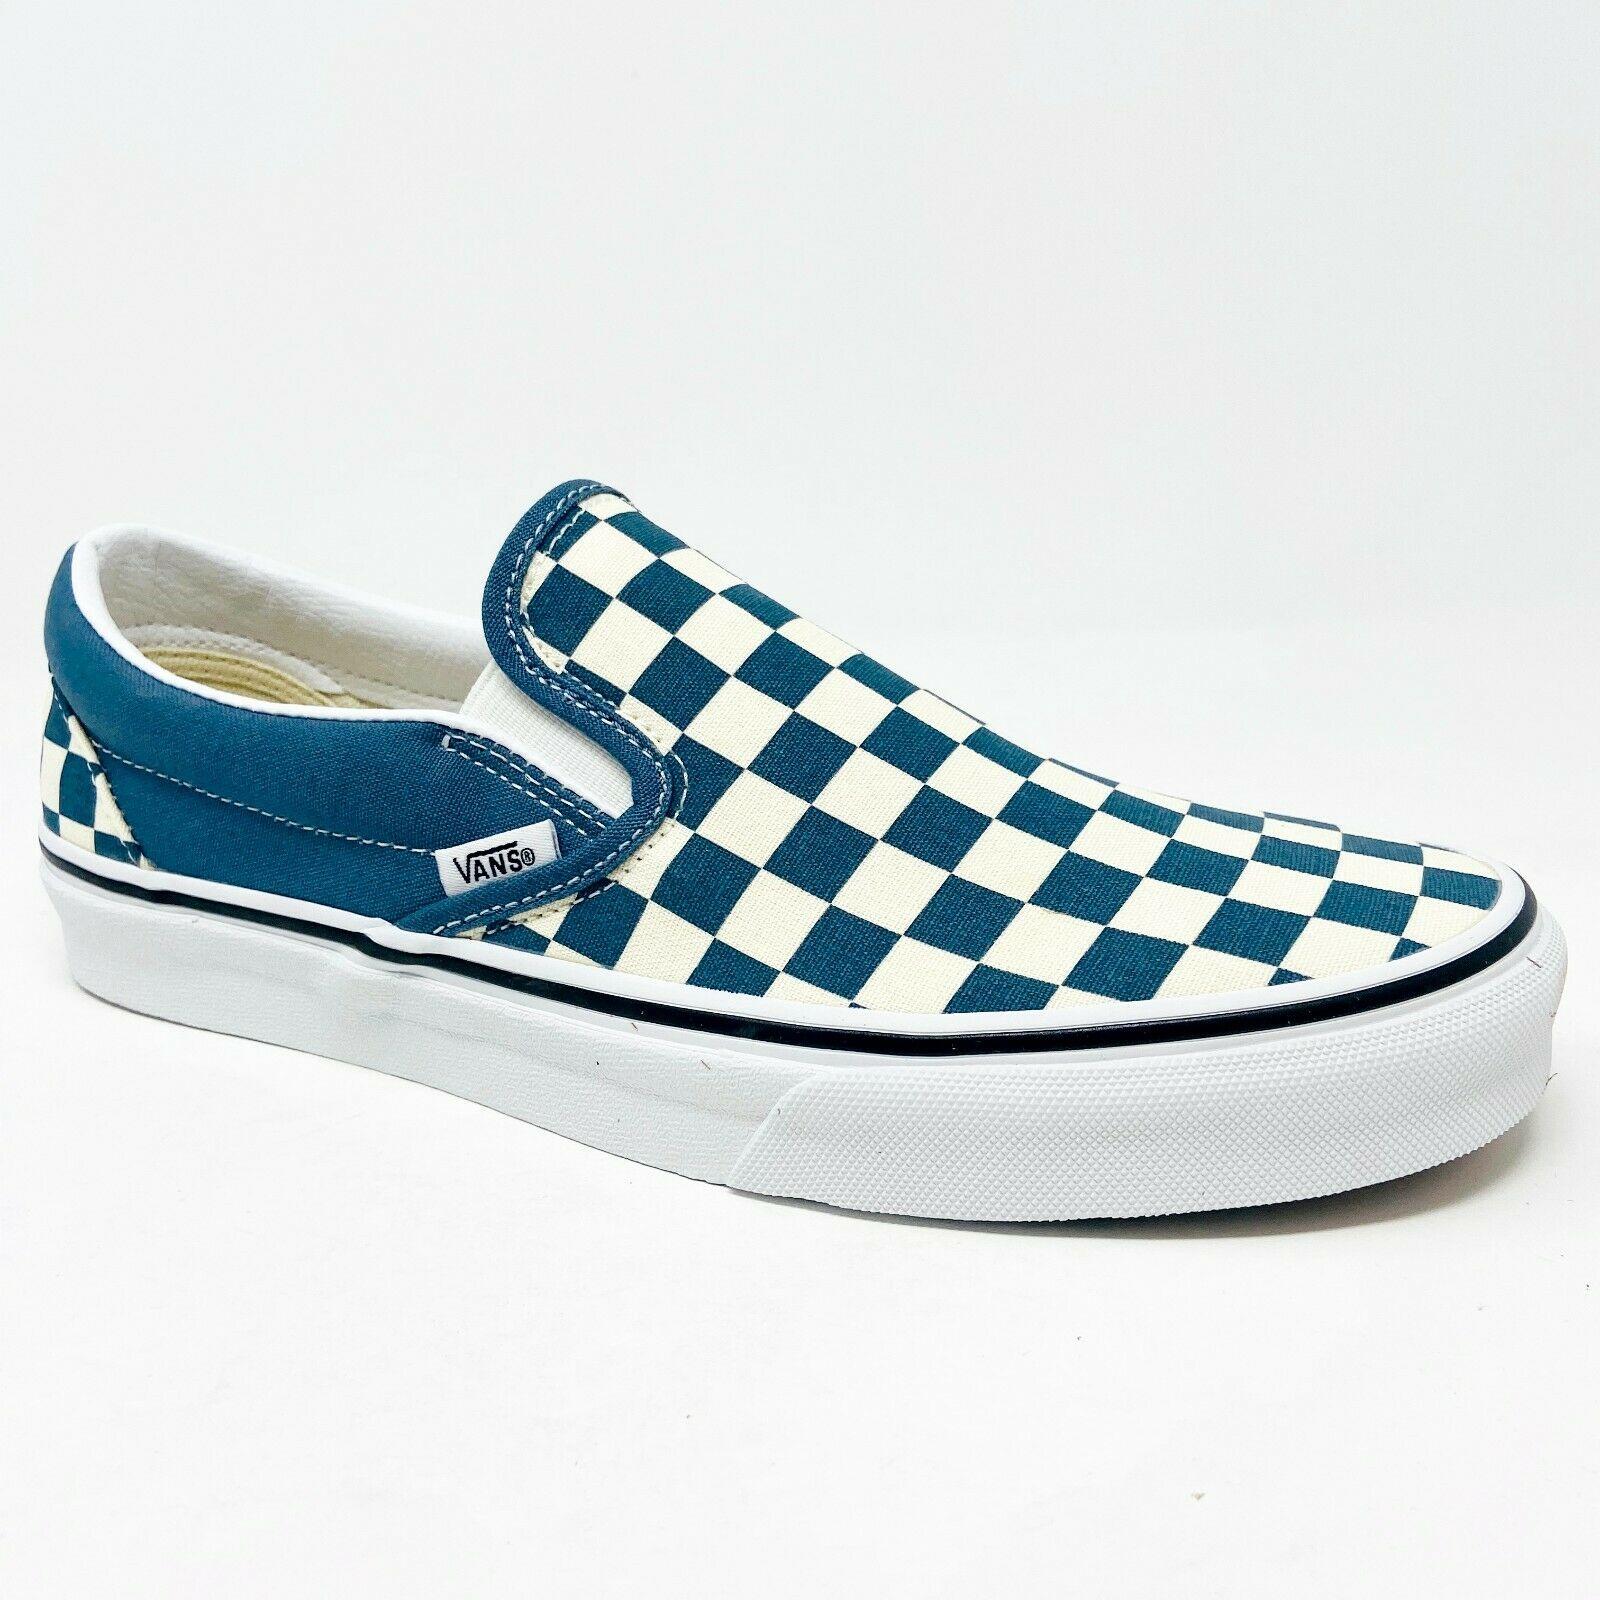 Vans Classic Slip On Checkerboard Ultramarine